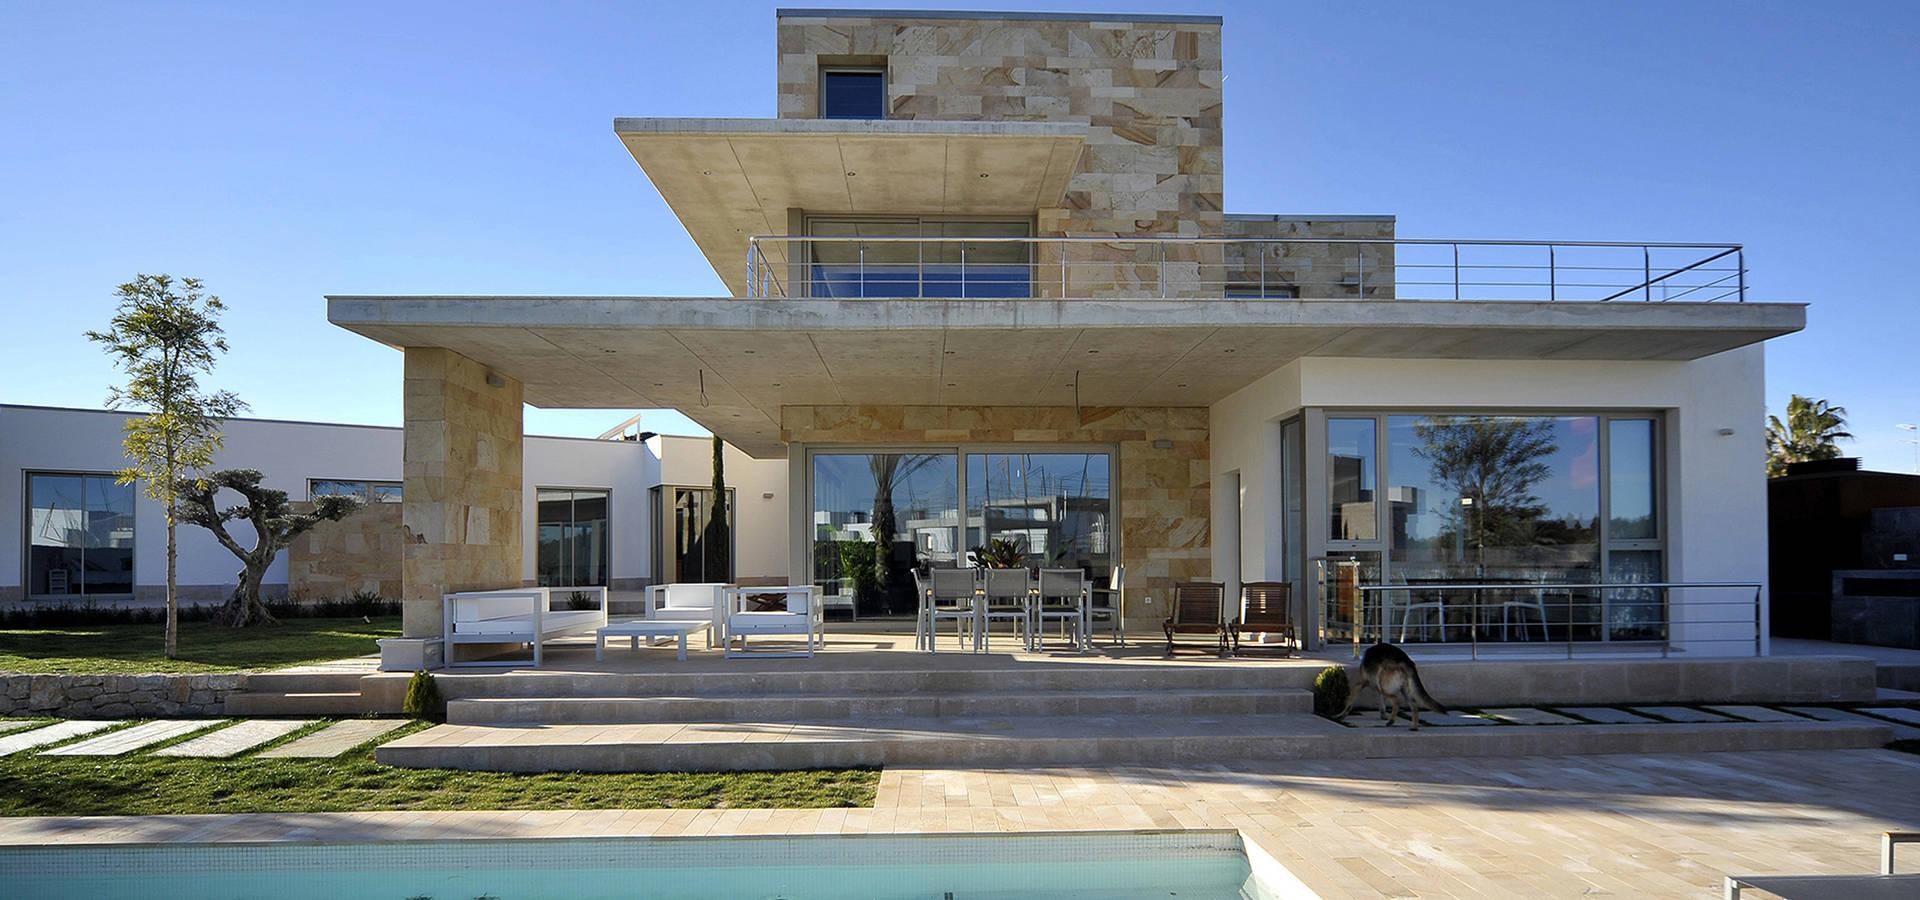 Chiarri arquitectura arquitectos en valencia homify - Arquitectos valencia ...